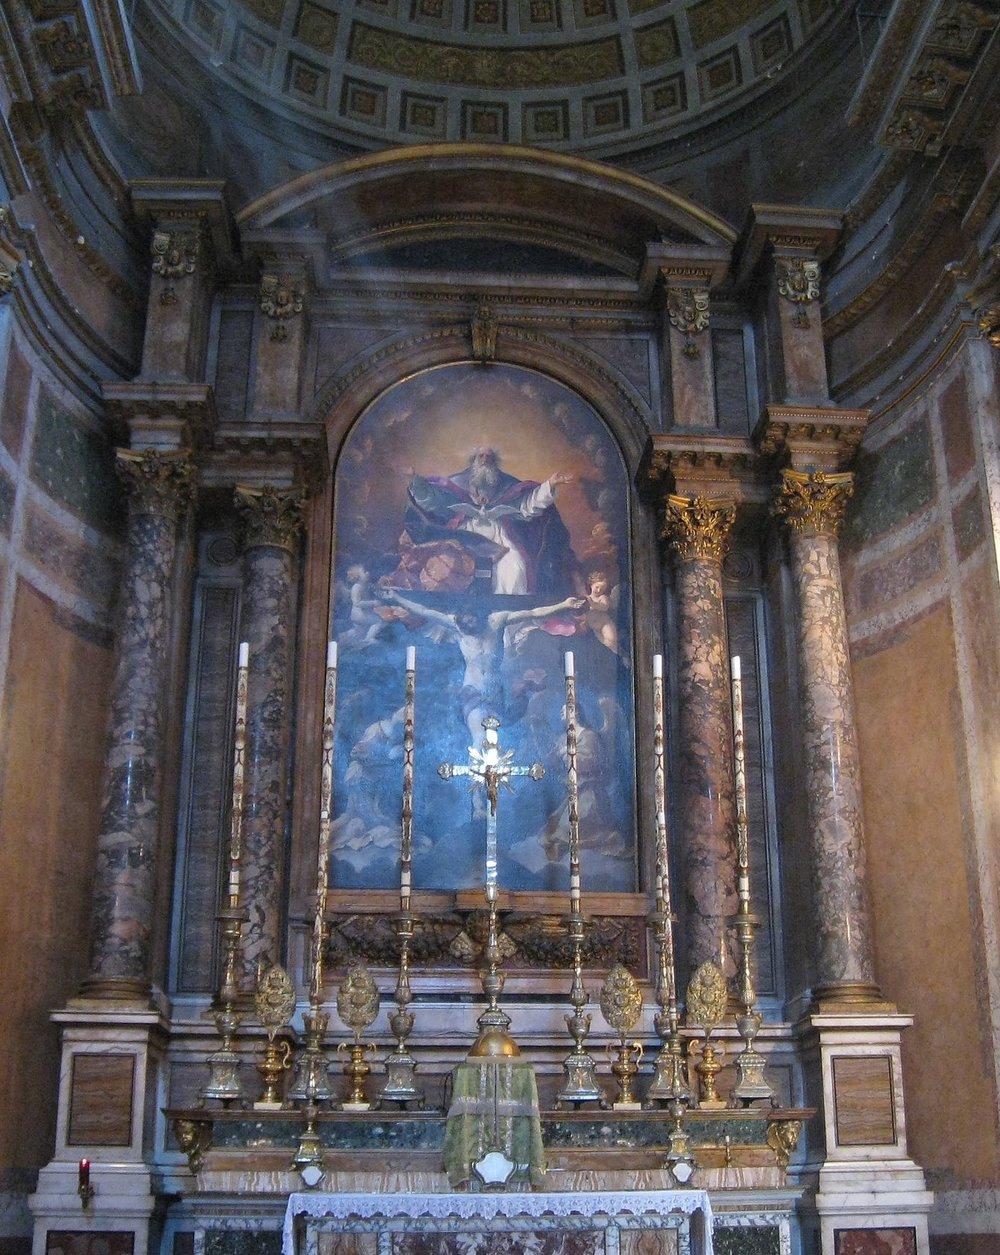 The high altar in Santissima Trinita dei Pellegrini at a moment when a ray of sunlight is on the crucifix